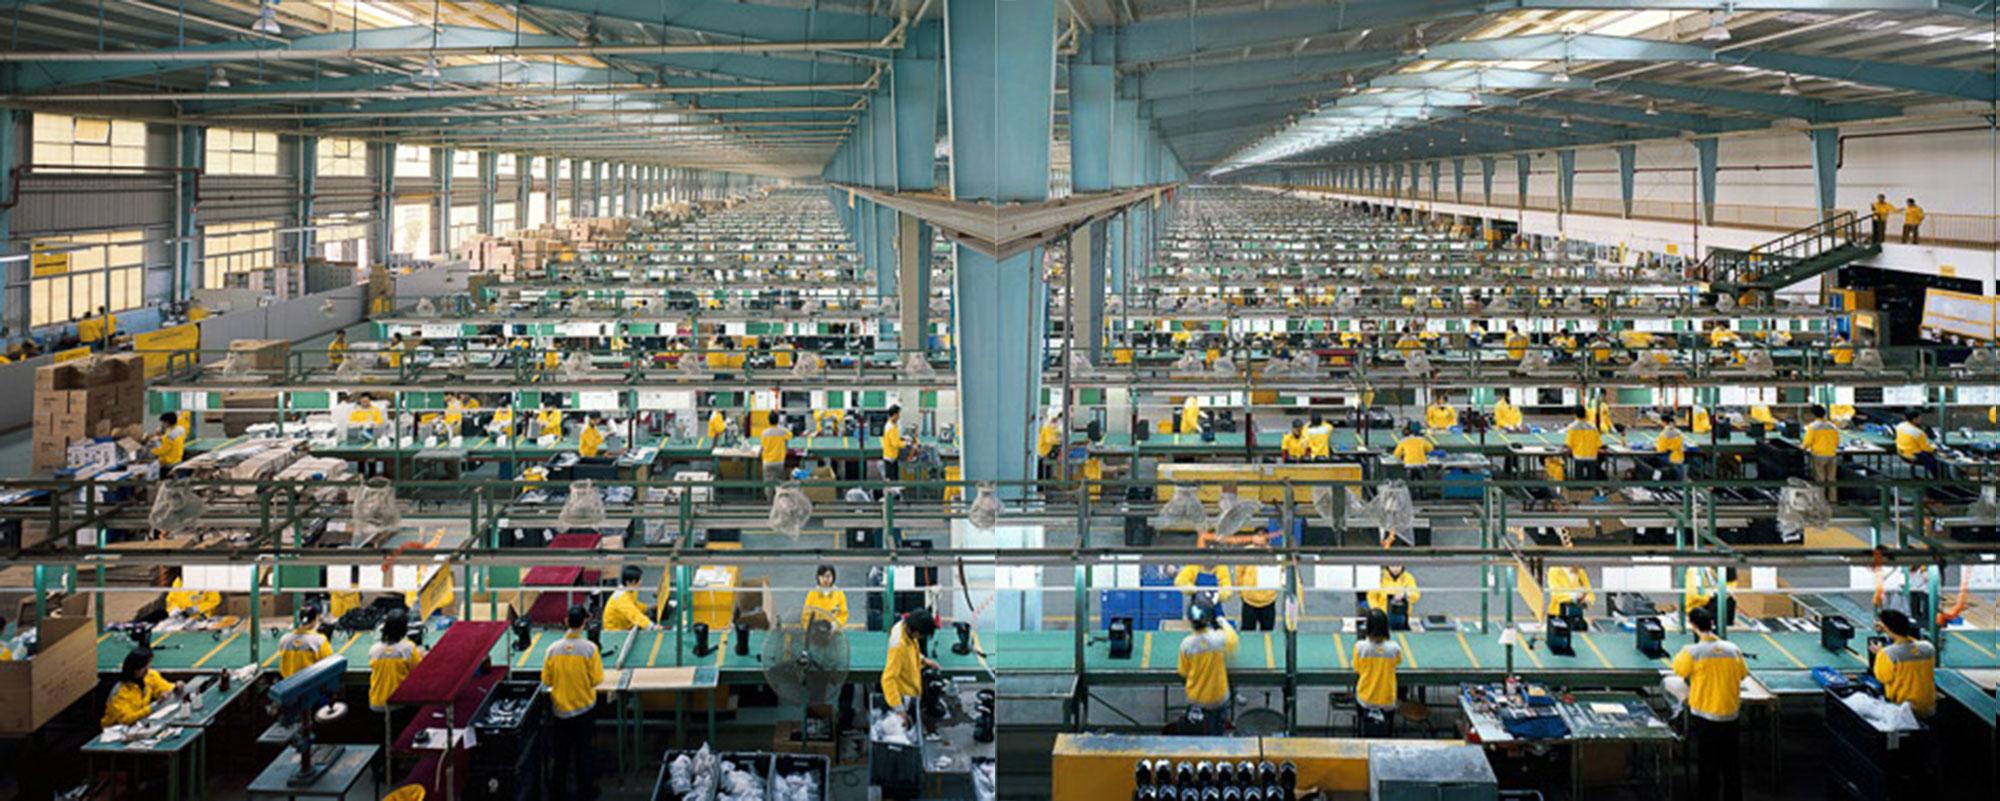 Cankun Factory, Xiamen City, China, 2005. Photo by Edward Burtynsky.